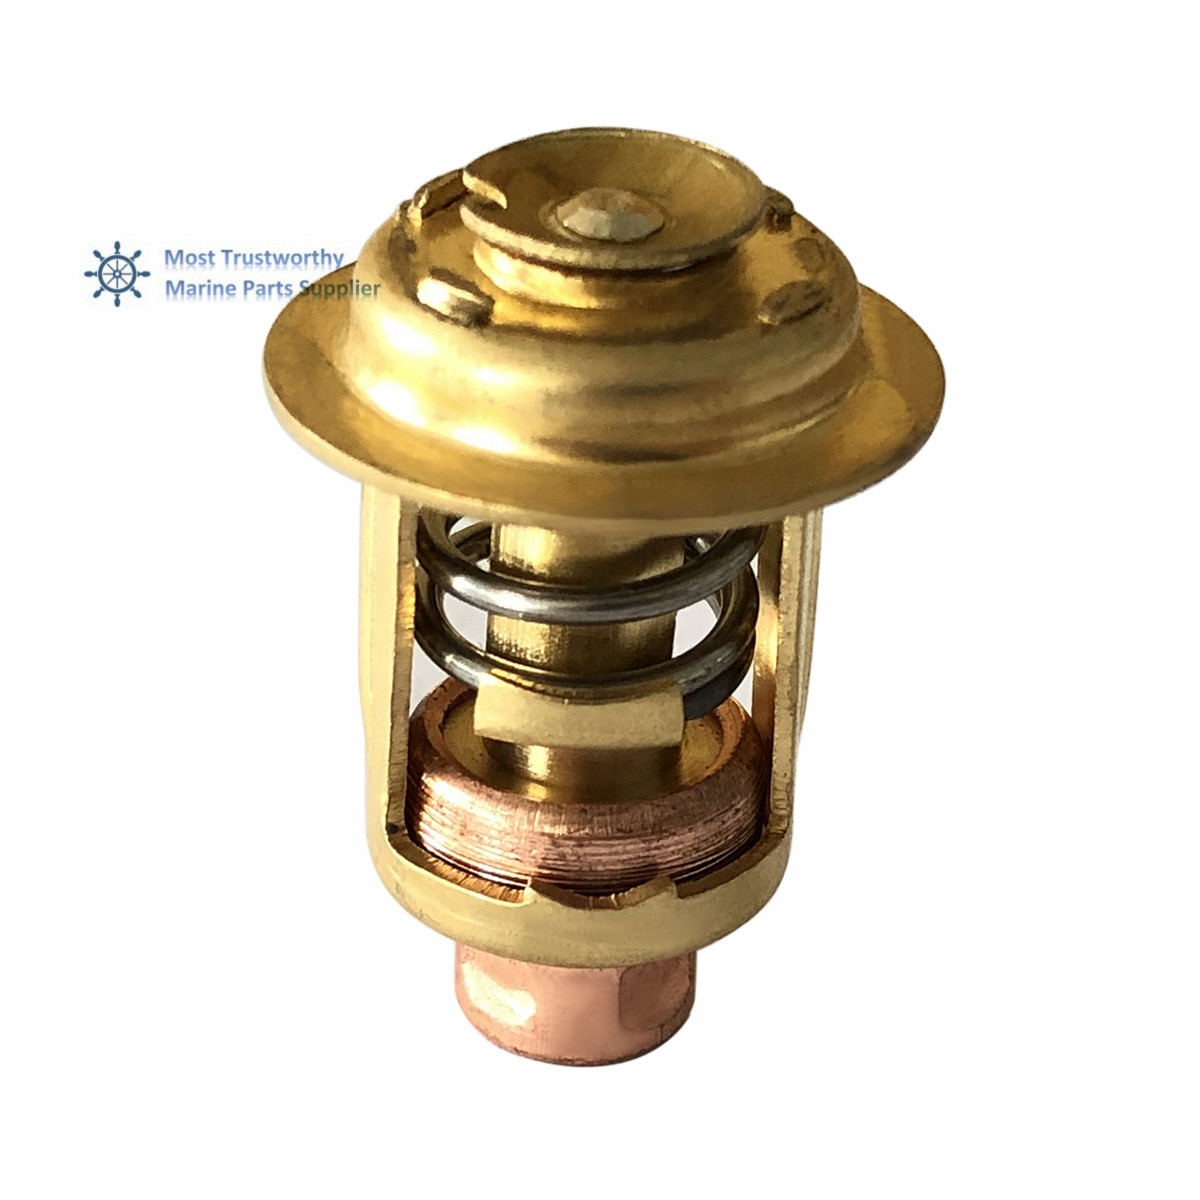 Nova Termostato 143F para Johnson Evinrude (5-235 HP) 18-3553 378065 393659 434841 5005440